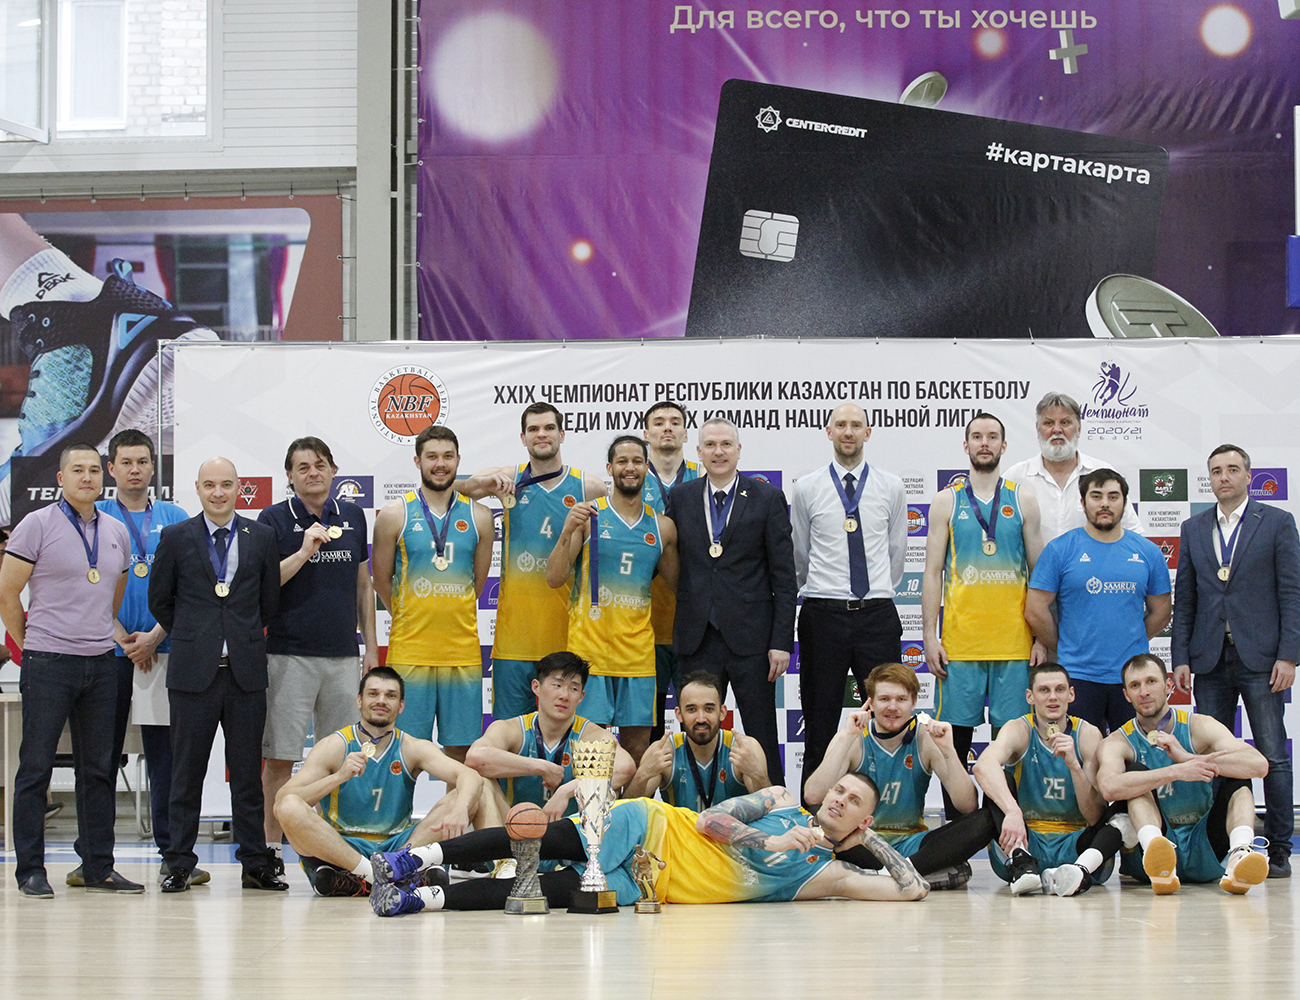 Astana Wins Kazakhstan Championship